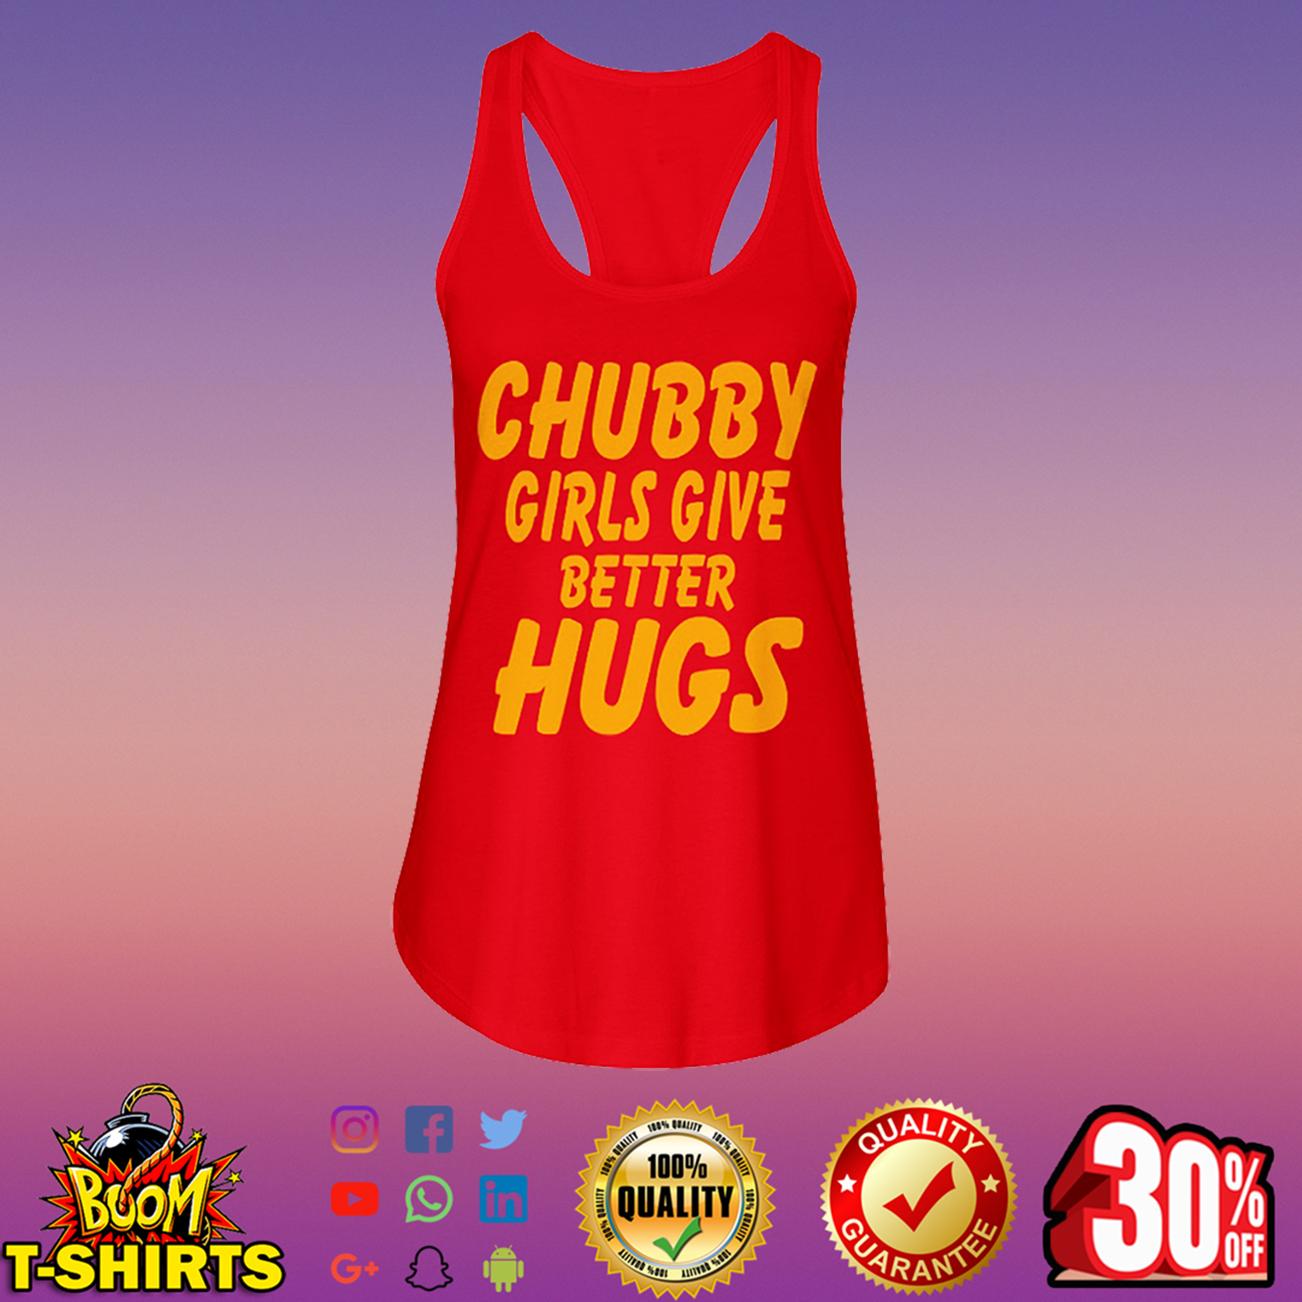 Chubby girls give better hugs flowy tank